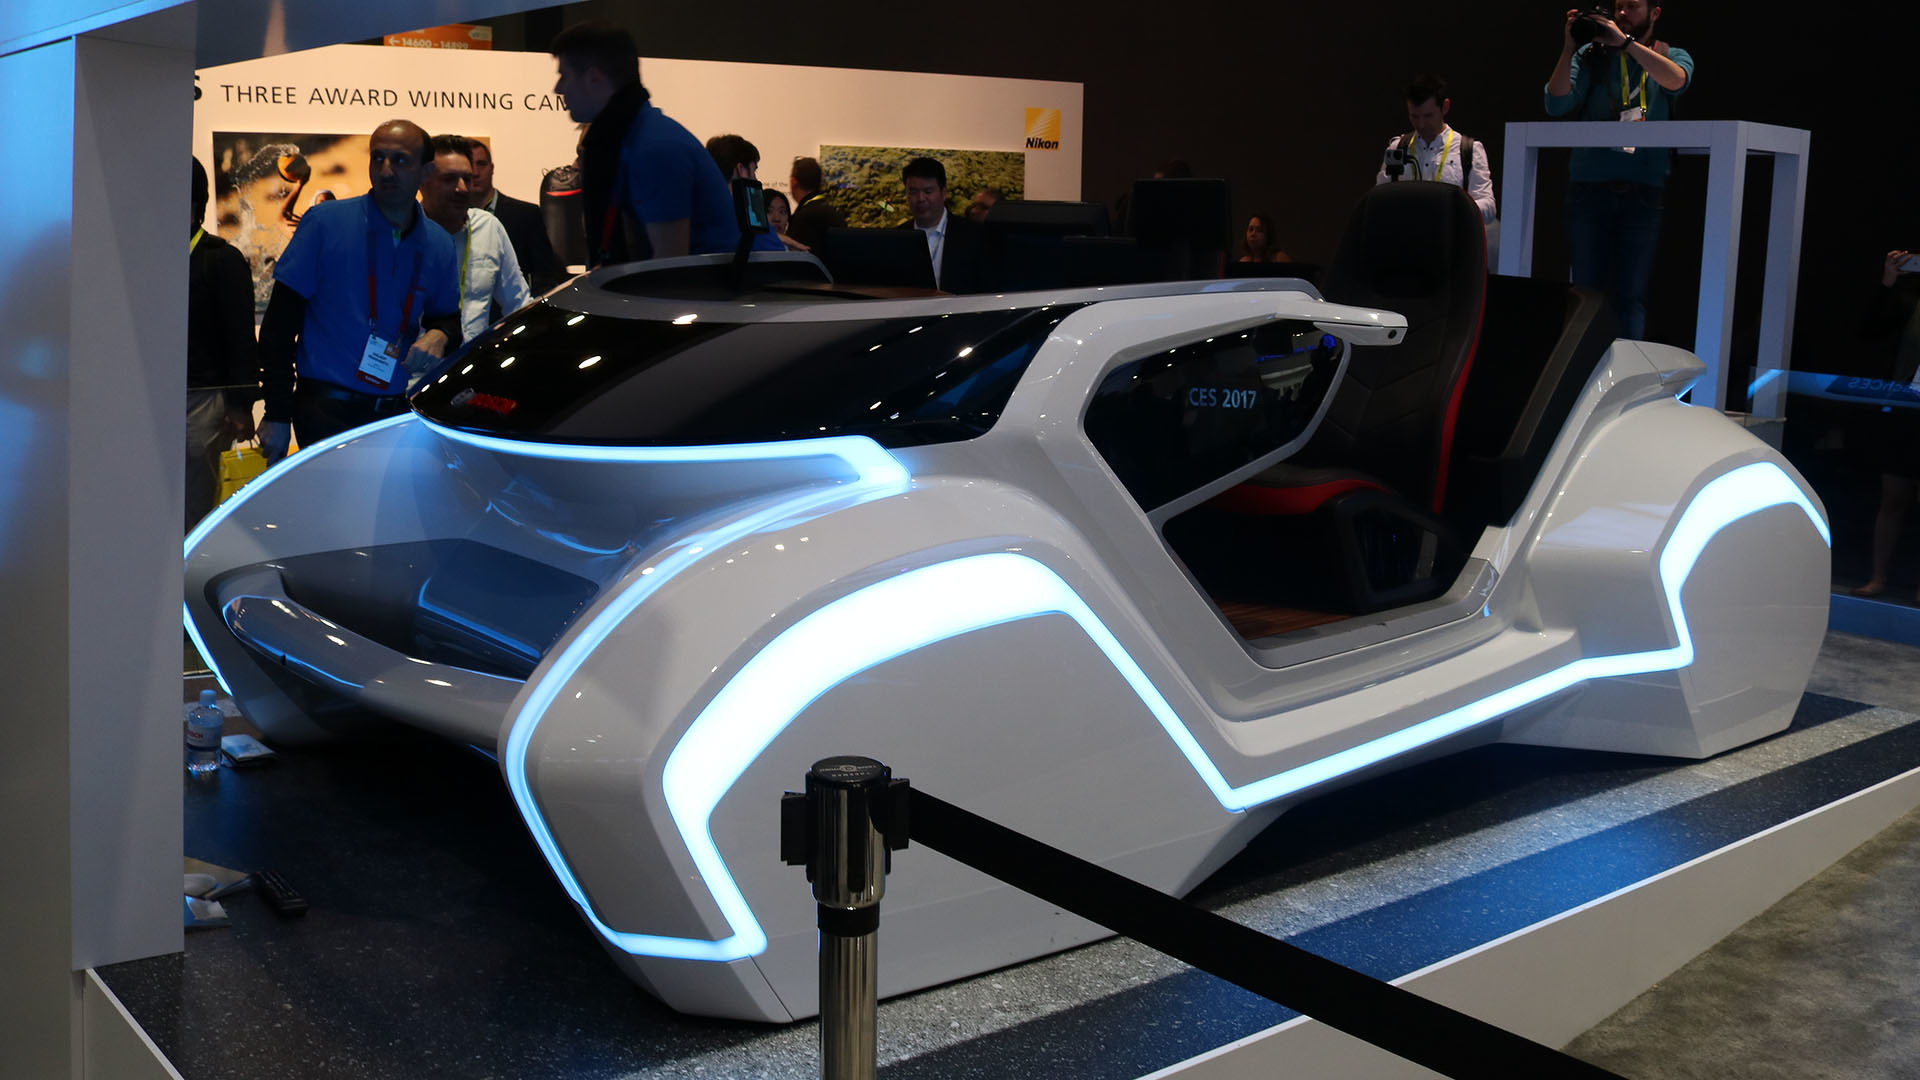 Admirable Boschs Ces Auto Interior Of The Future Is An Assistant On Interior Design Ideas Tzicisoteloinfo